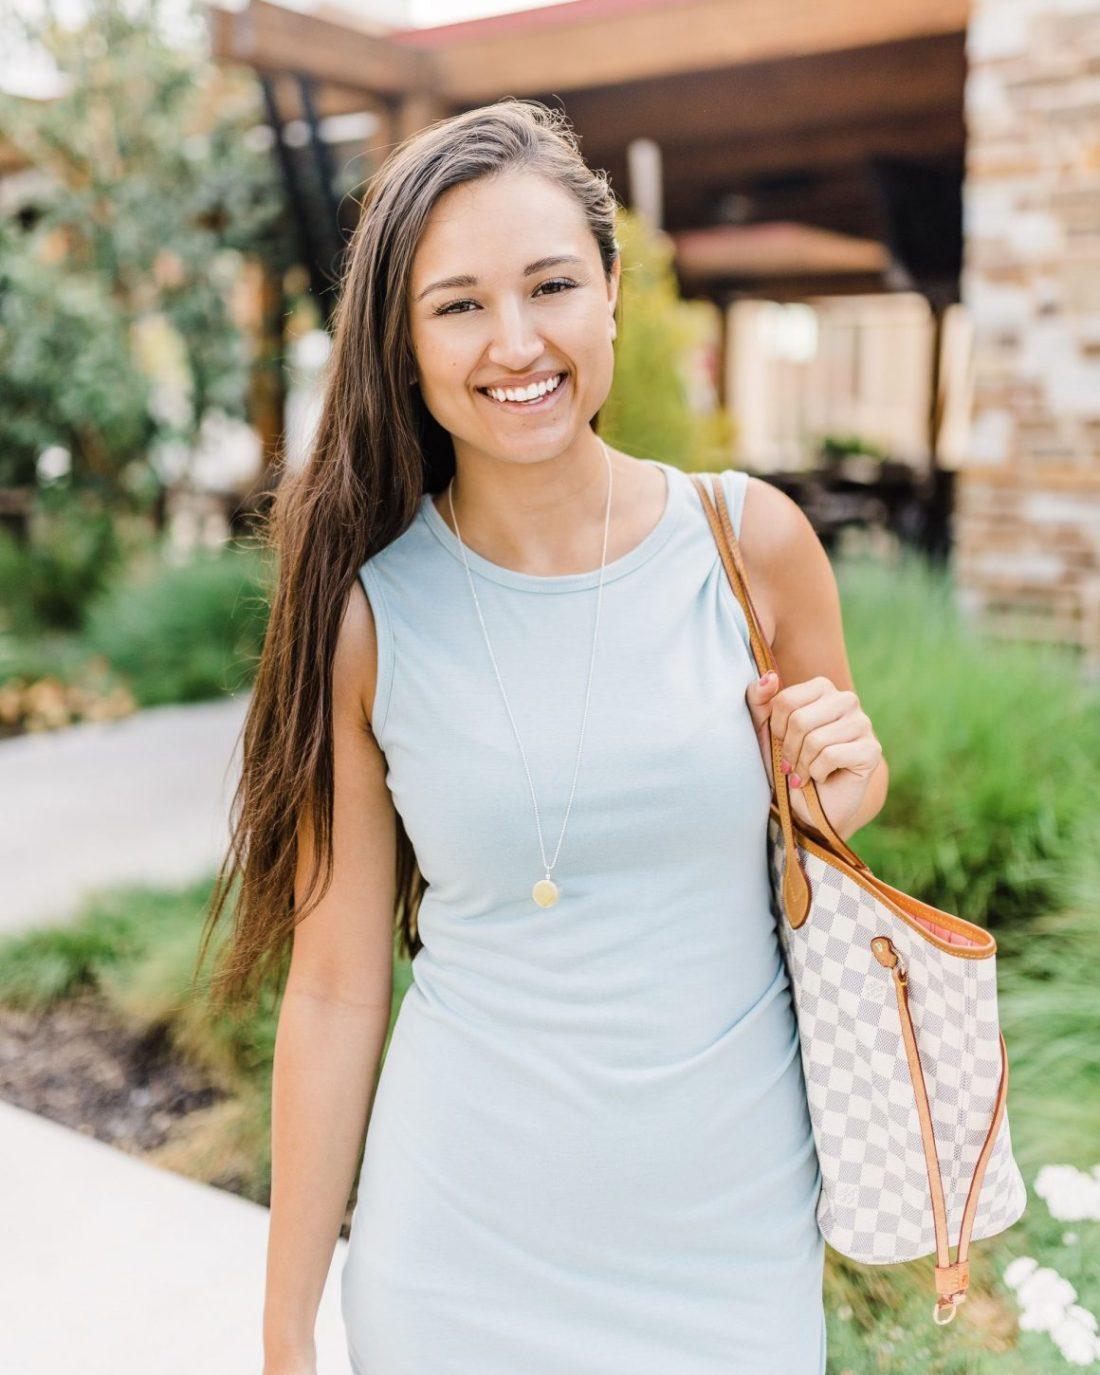 Mondri Jewelry Amber Collection